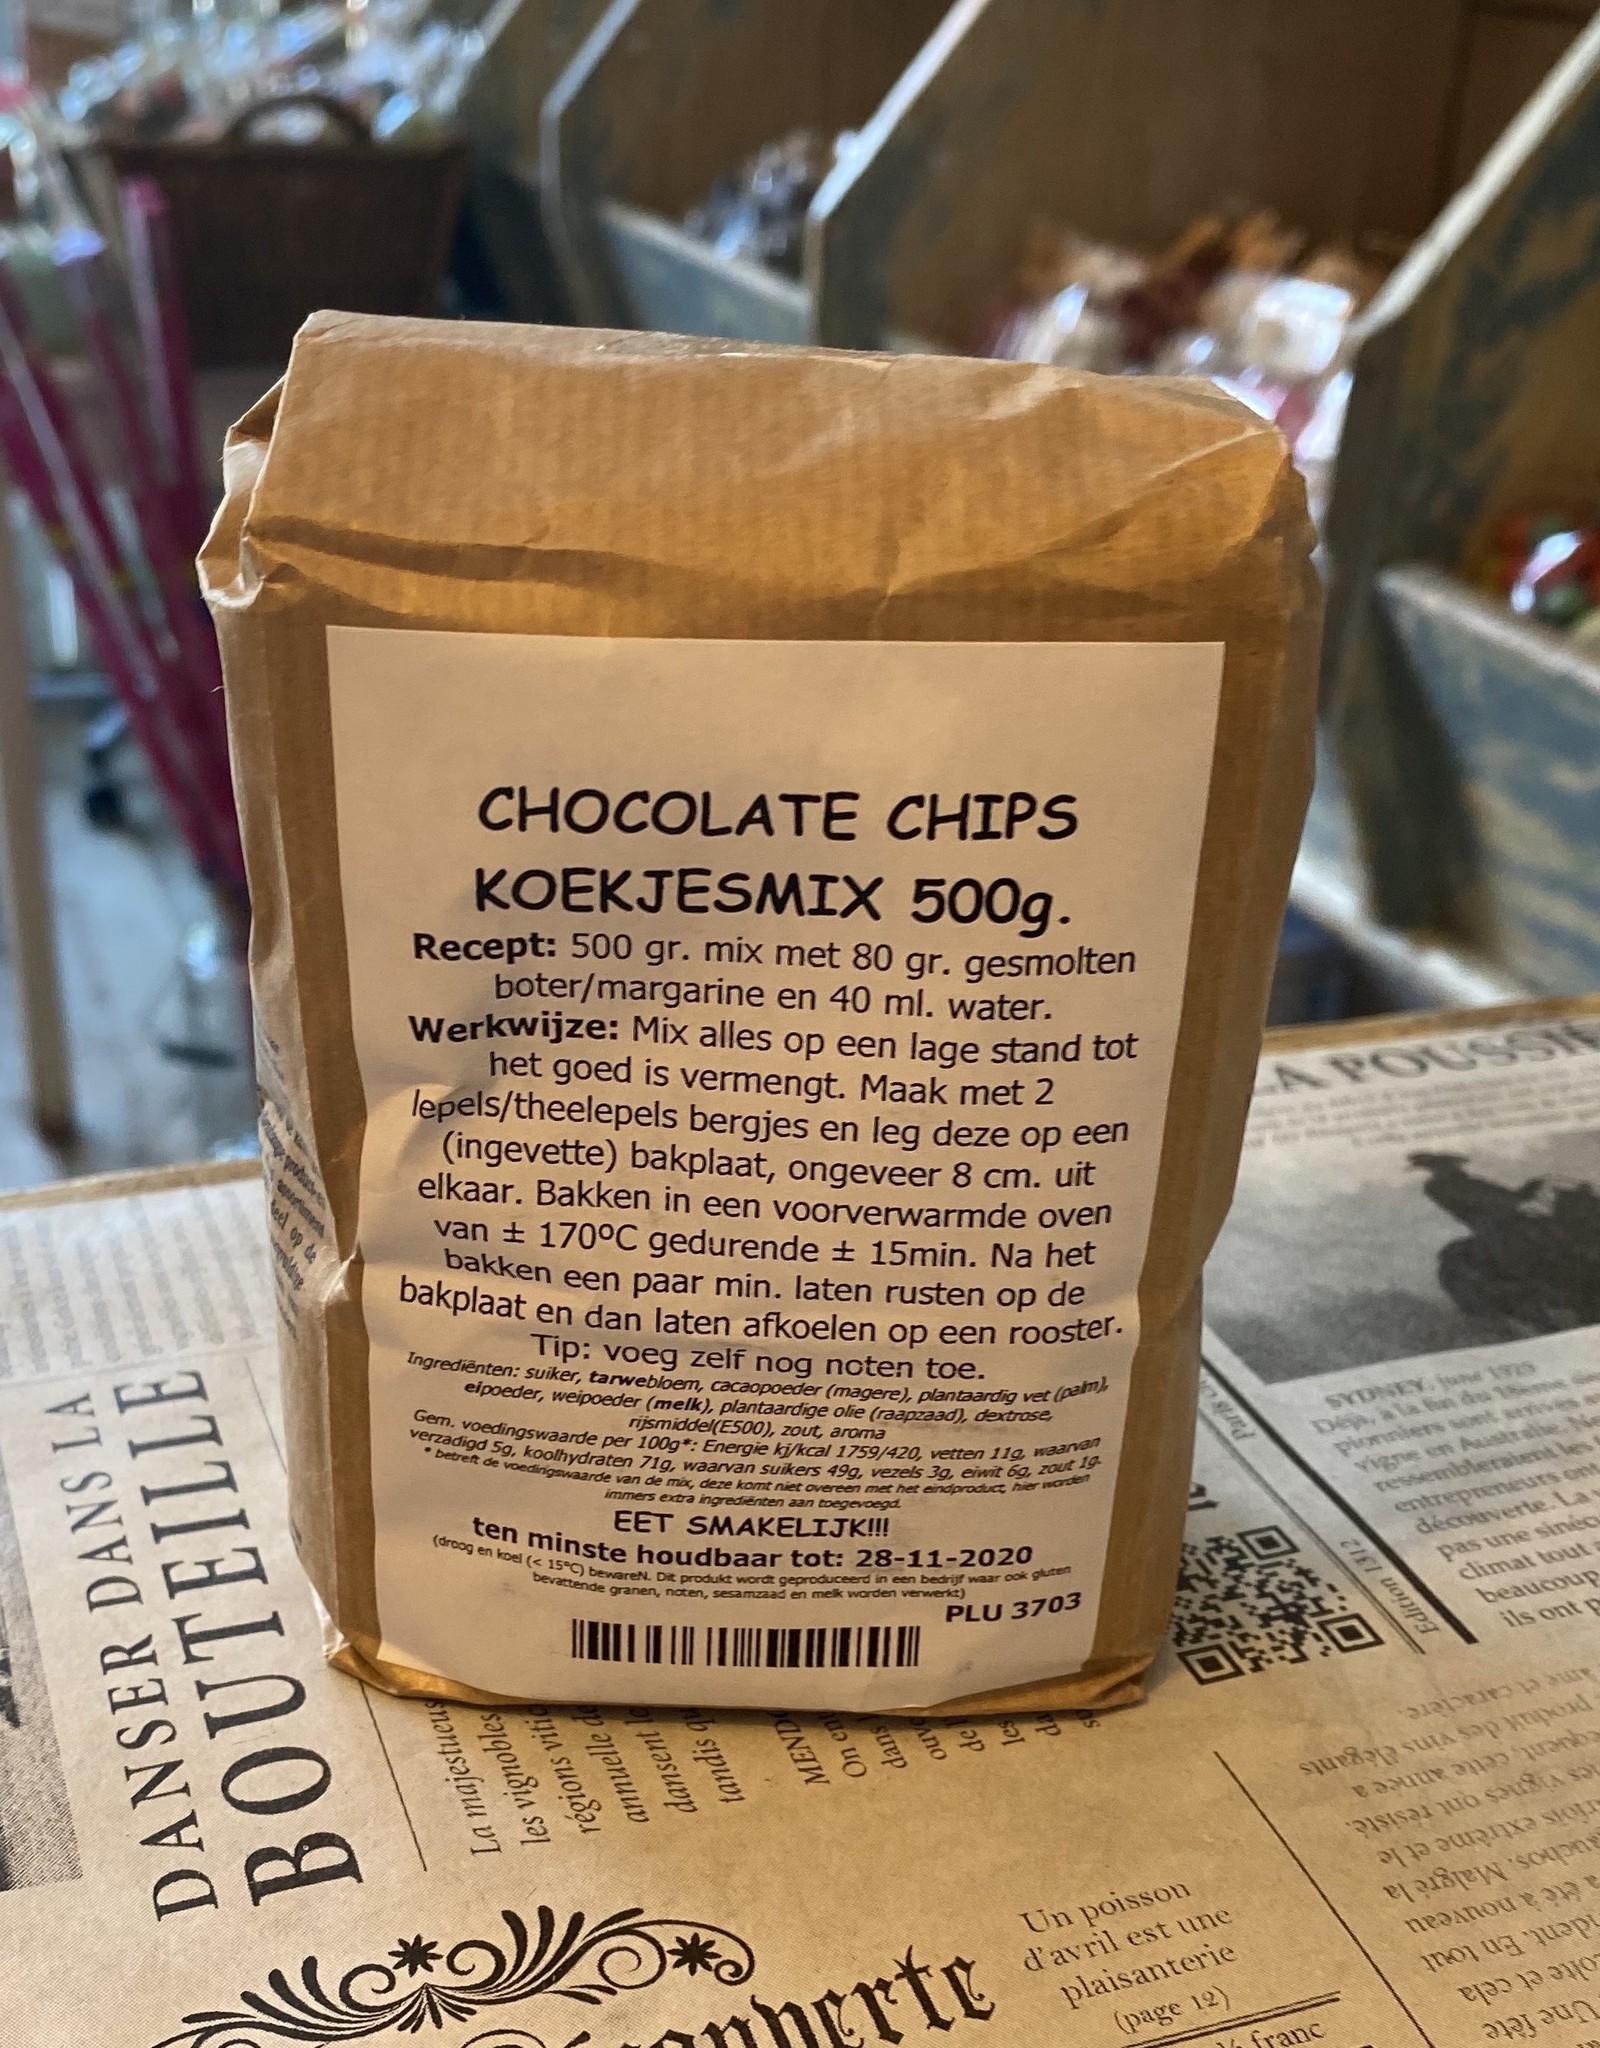 Chocolate Chips Koekjesmix